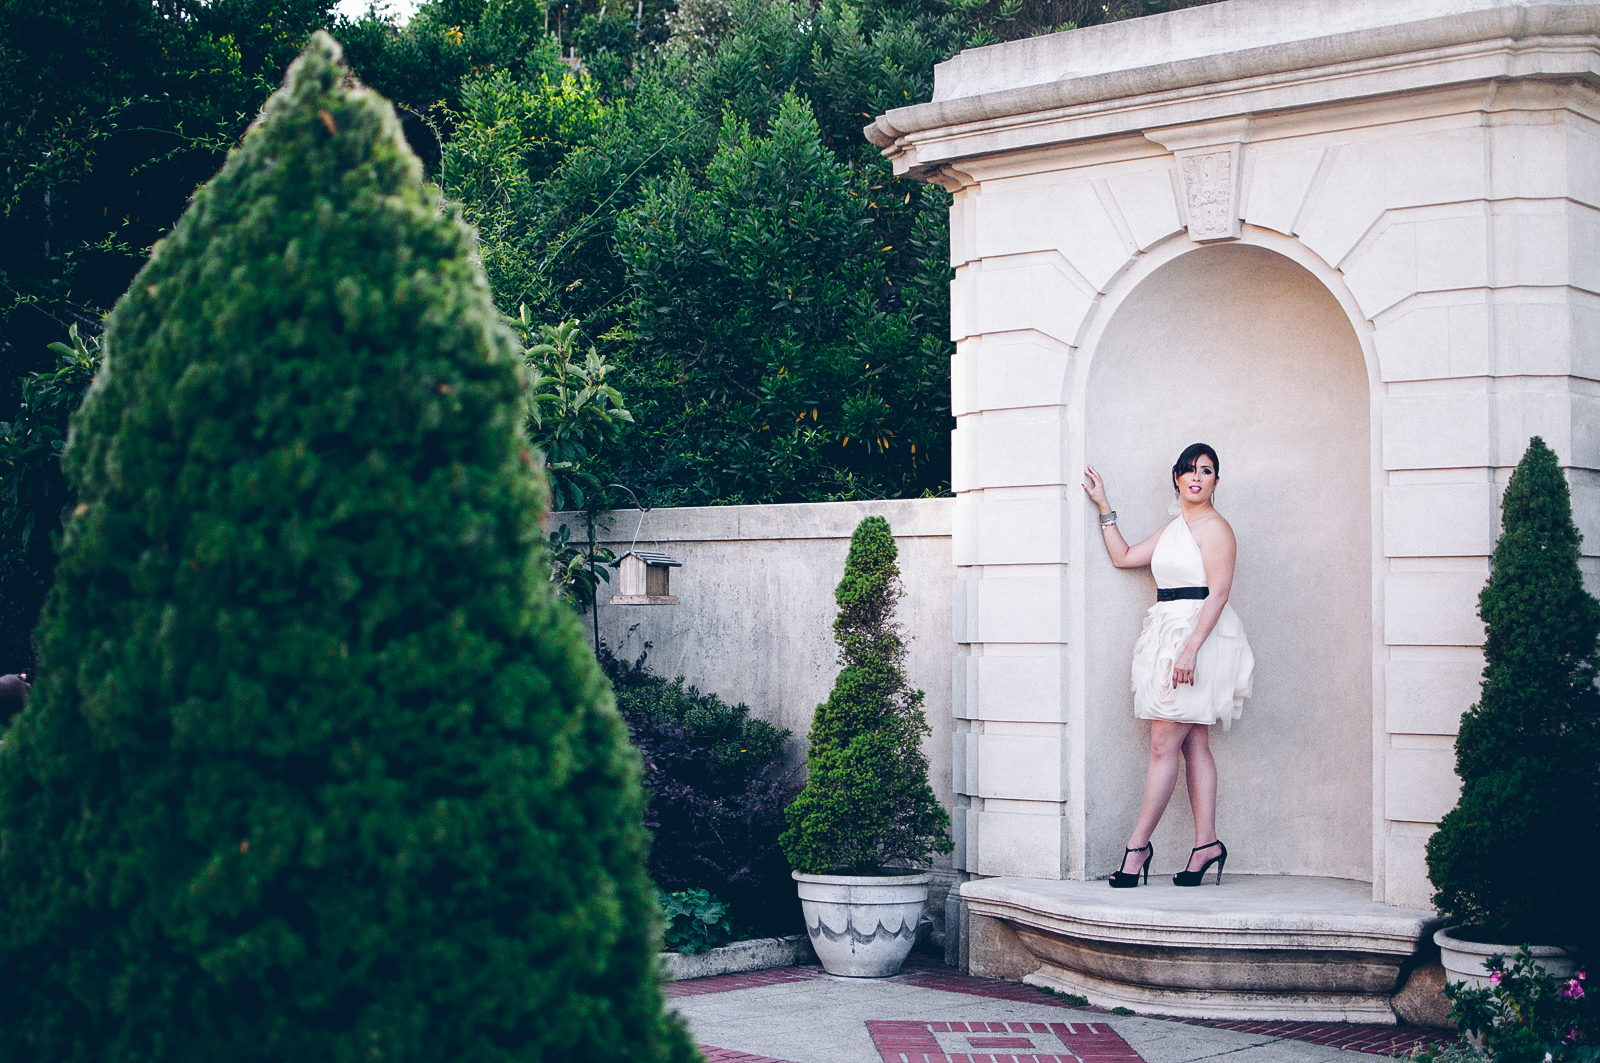 greens_restaurant_wedding_photography_san_franscisco_ebony_siovhan_bokeh_photography_18.jpg